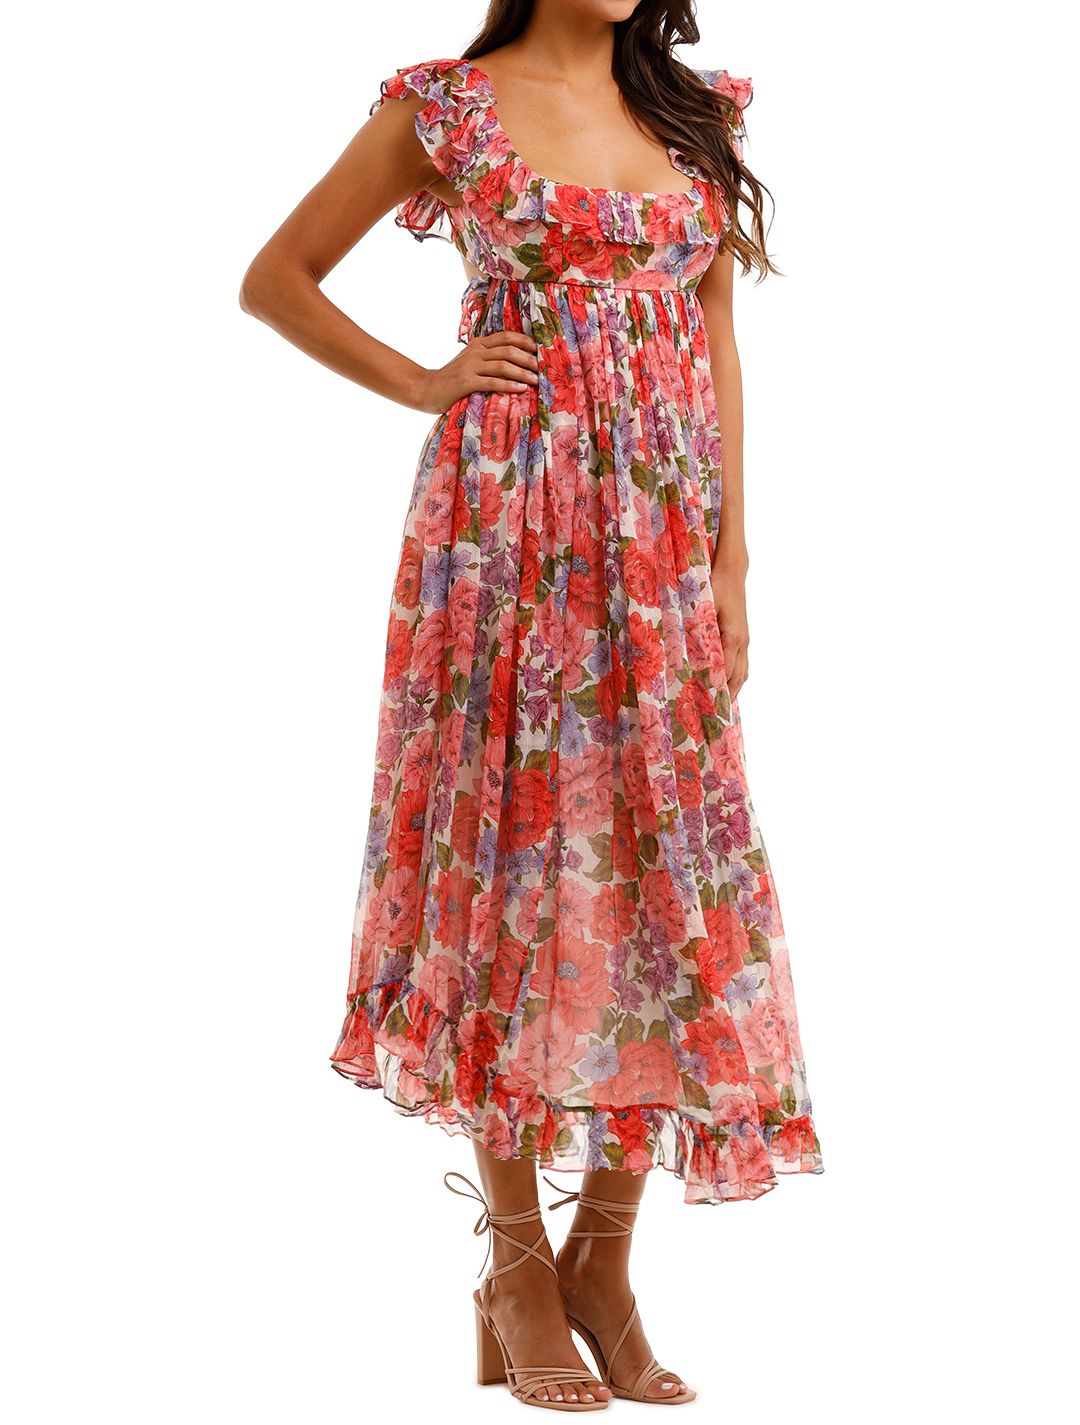 Zimmermann Poppy Frill Edge Midi Dress Ruffles Floral